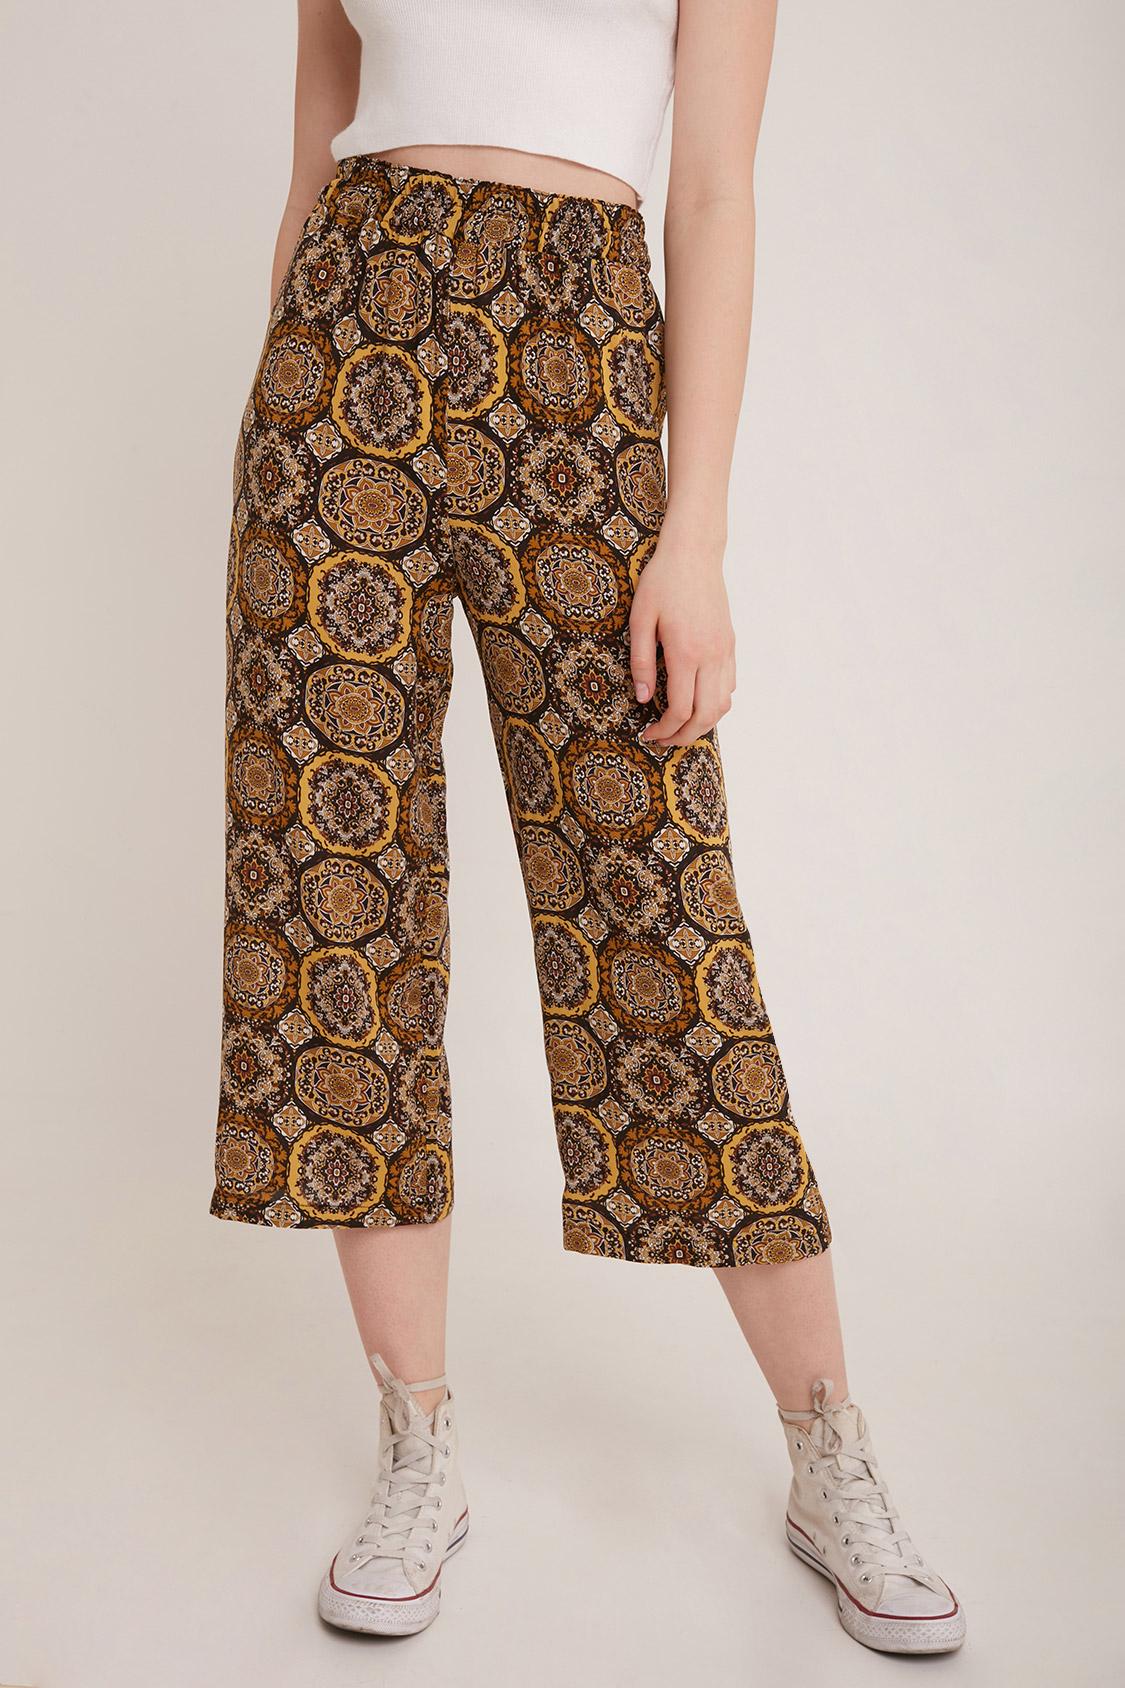 Crop Pantaloni Pantaloni Culotte Crop Culotte Crop Crop Culotte Pantaloni Culotte Crop Culotte Pantaloni Pantaloni Rq54AjL3